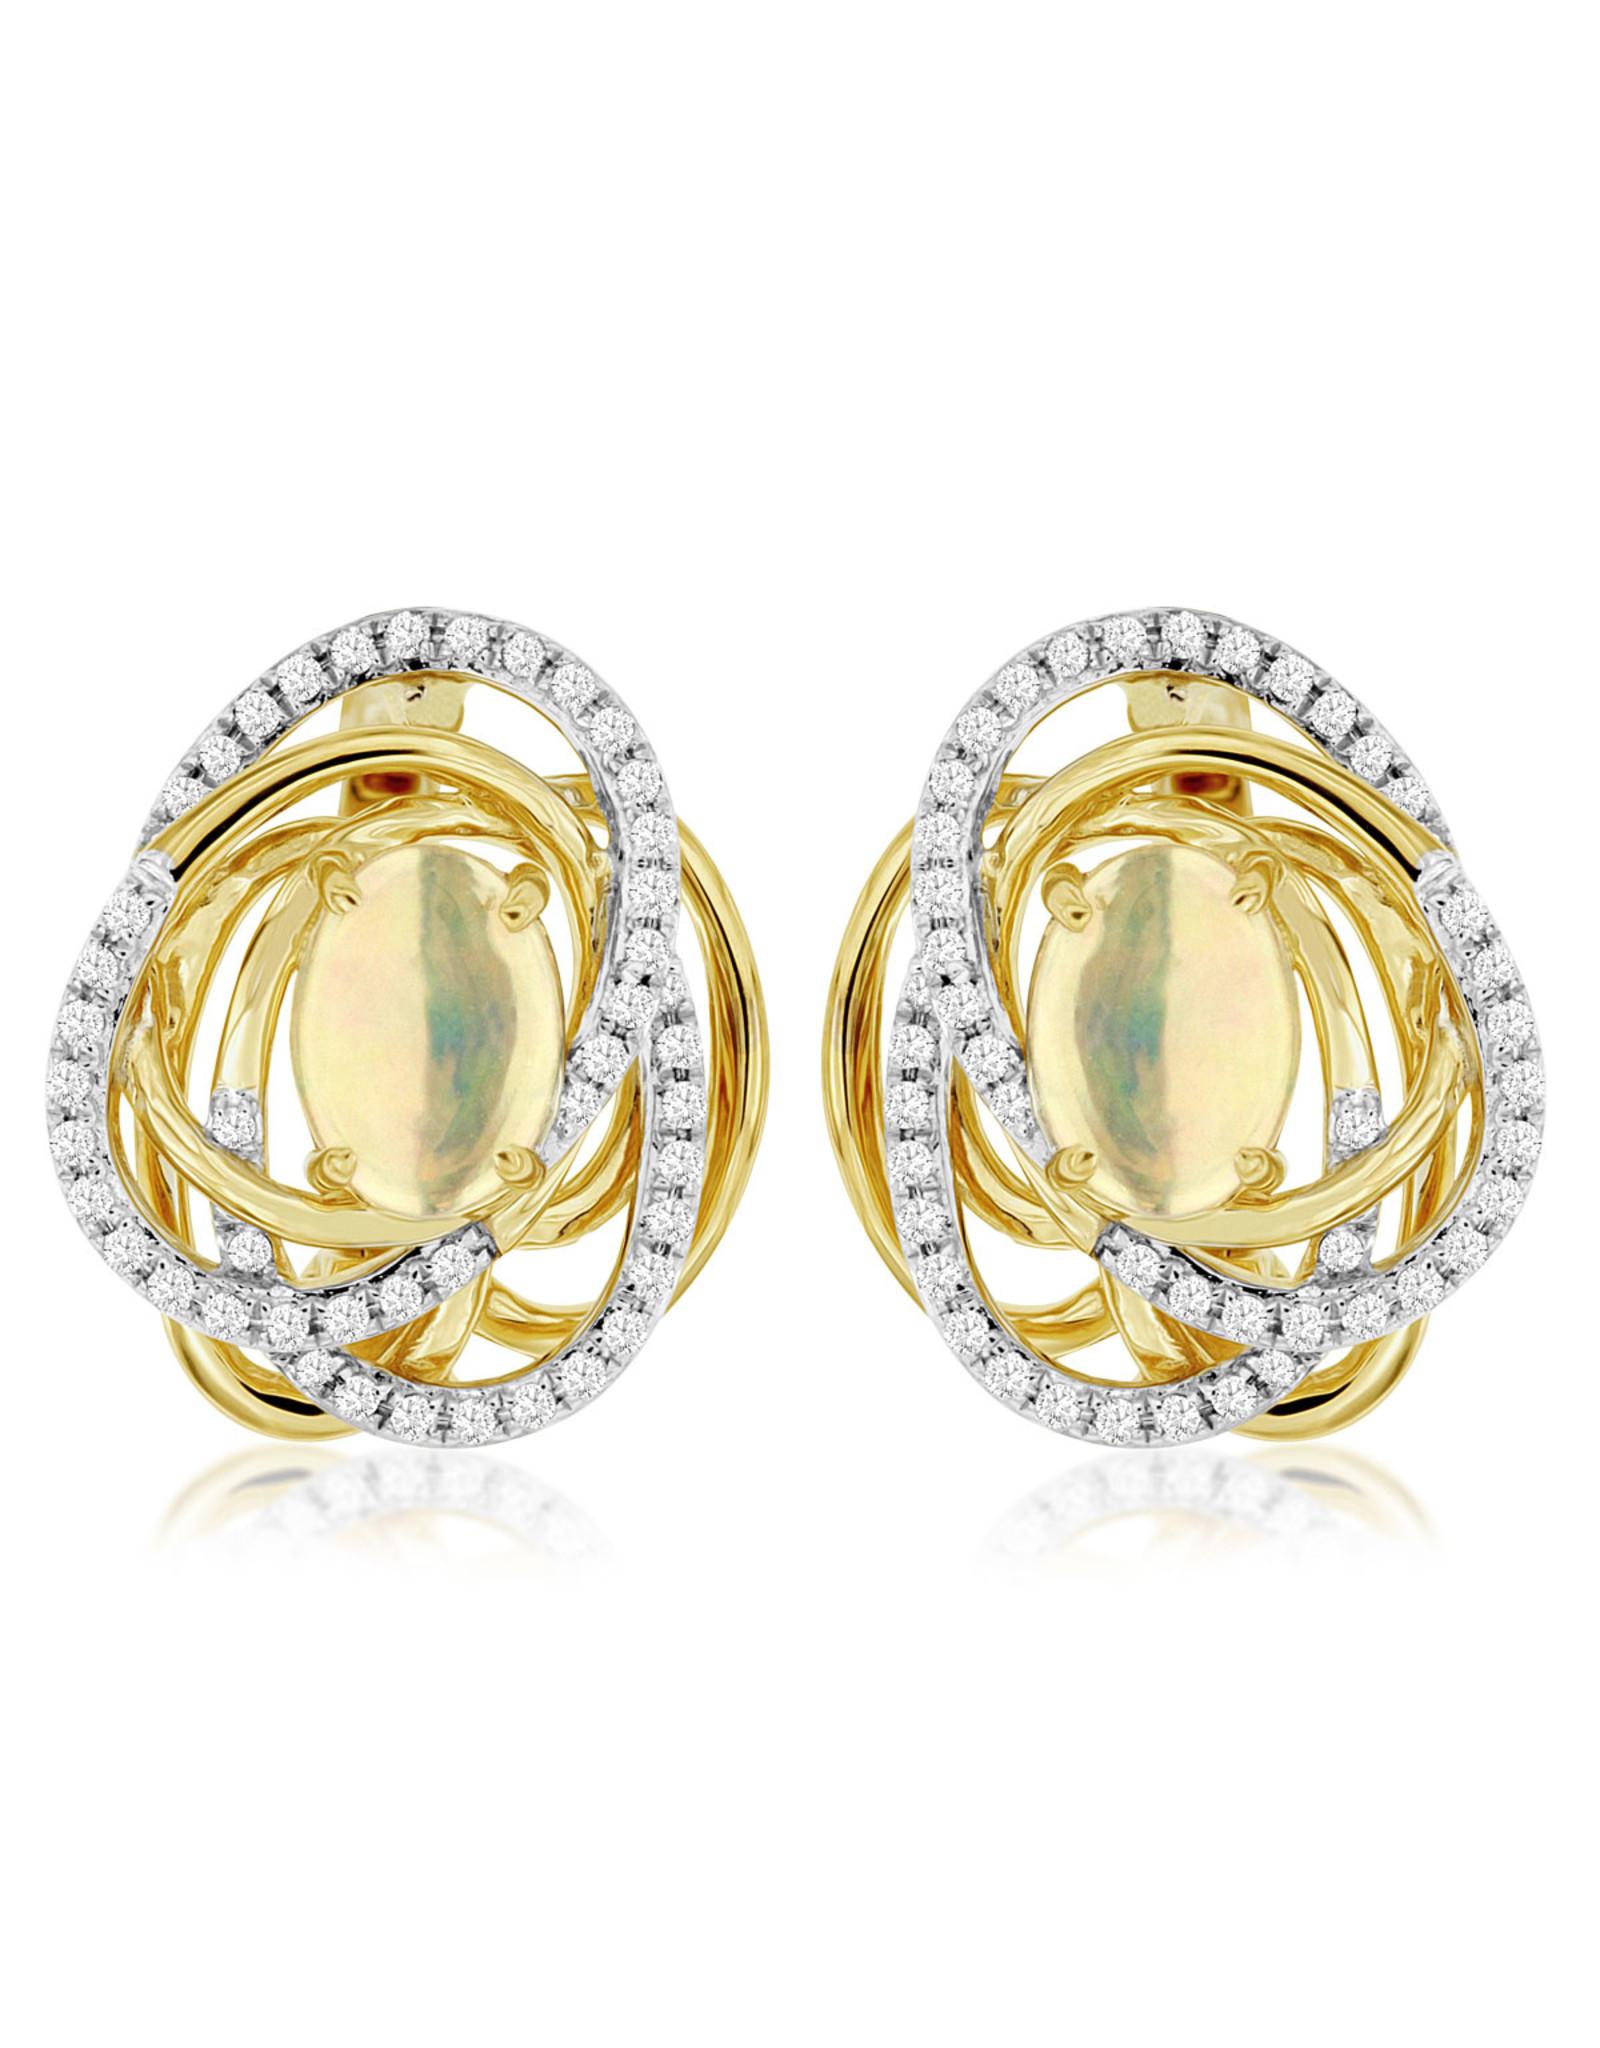 14K Yellow Gold Ethiopian Opal and Diamond Earrings, O: 1ct, D: 0.30ct